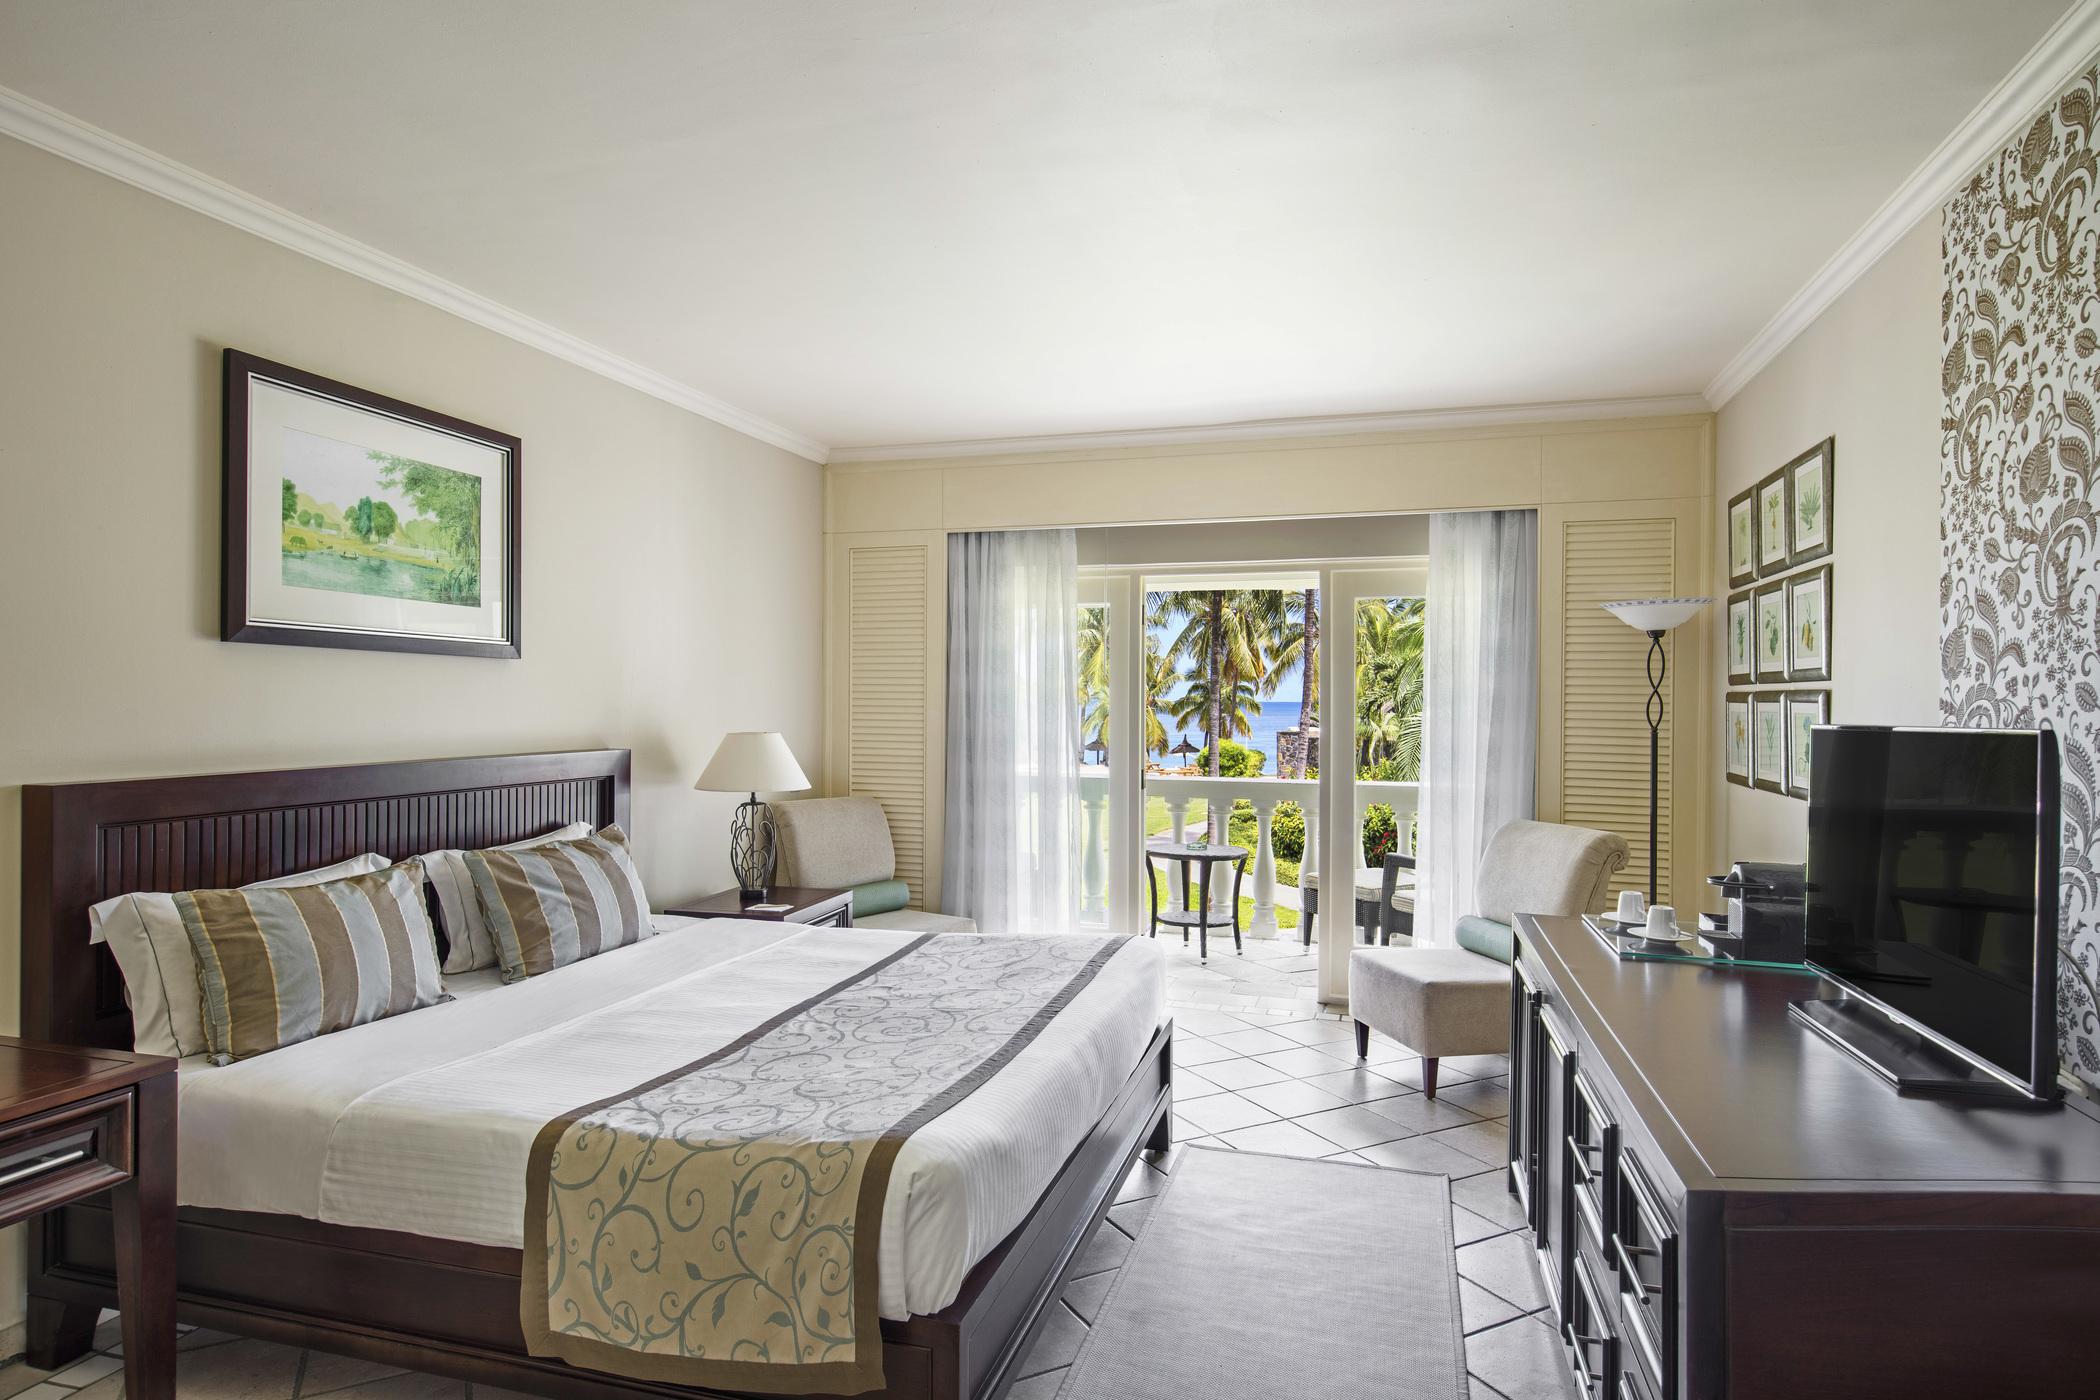 Sugar_Beach_Rooms_Sea_View_Manor_House-2100x1400-4fa7466d-157e-4e27-9cab...